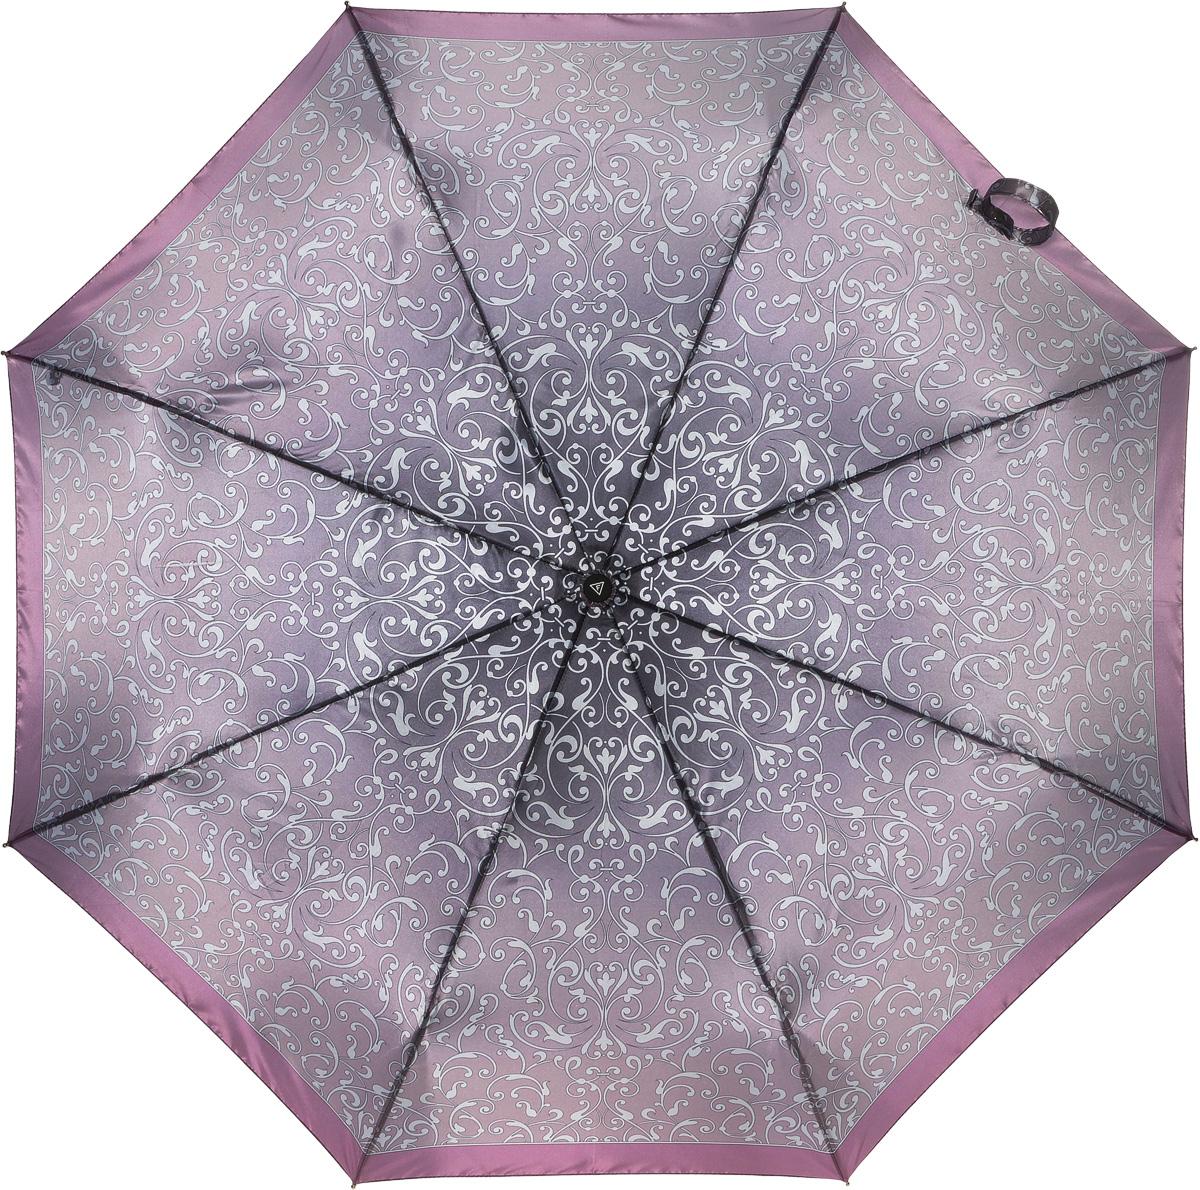 Зонт женский Fabretti, автомат, 3 сложения. L-16104-18L-16104-18Зонт женский Fabretti, облегченный суперавтомат, 3 сложения